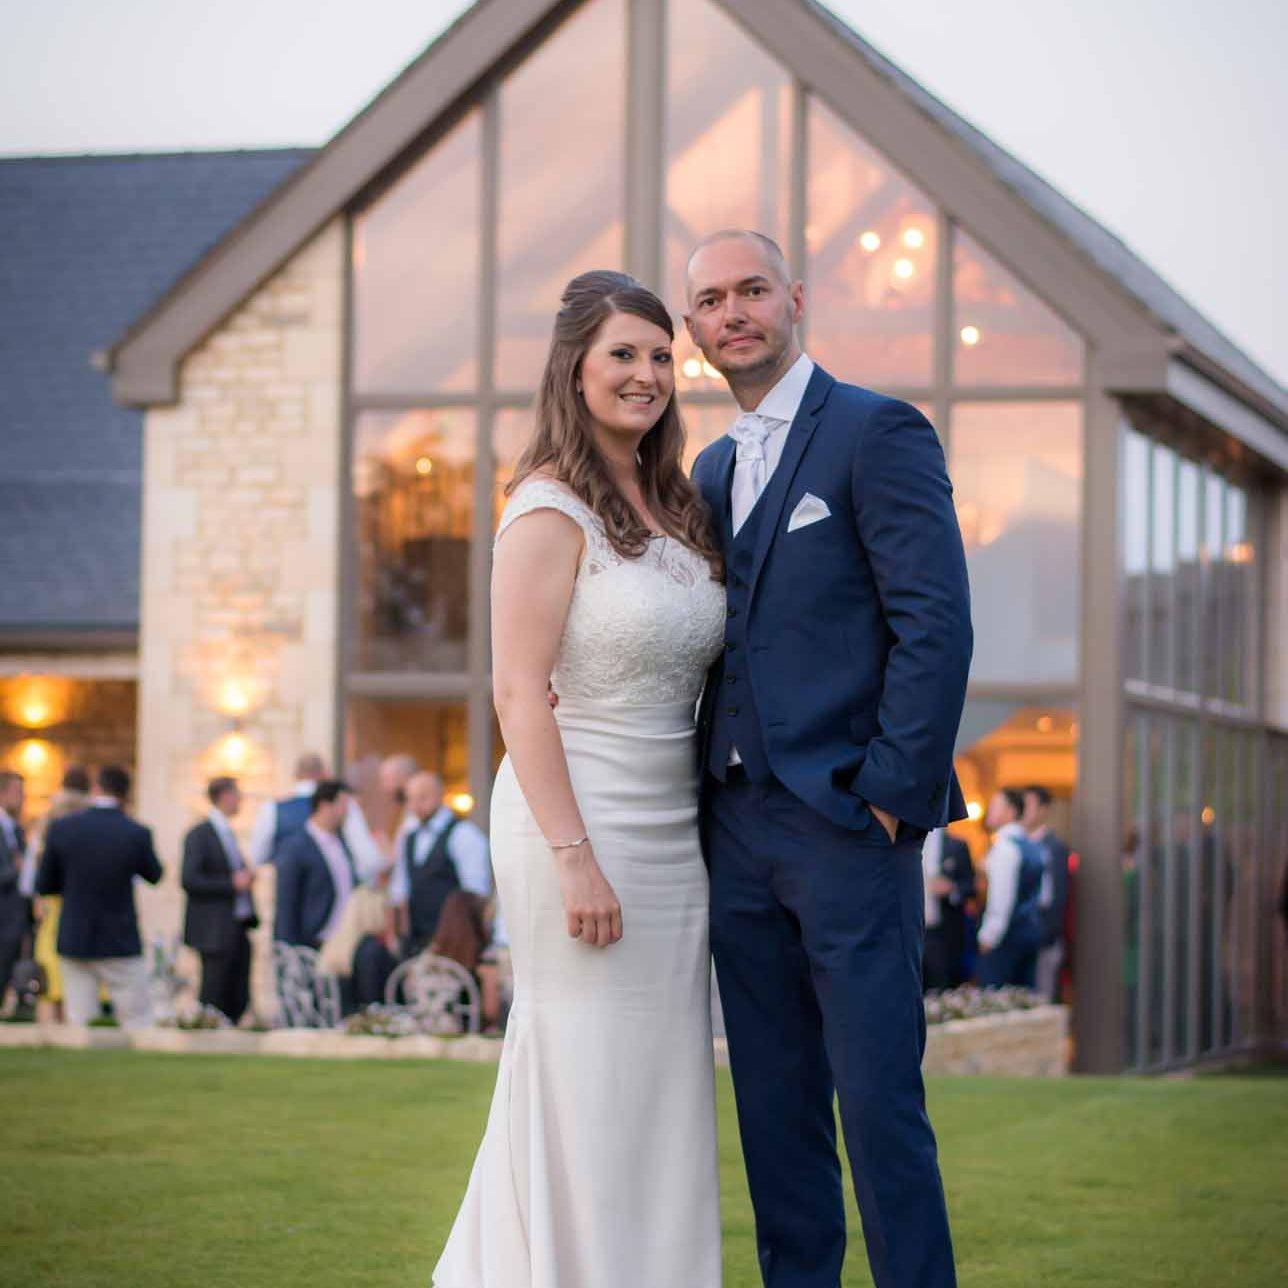 Blackwell Grange Warwickshire Wedding Photography Lorna Ryan